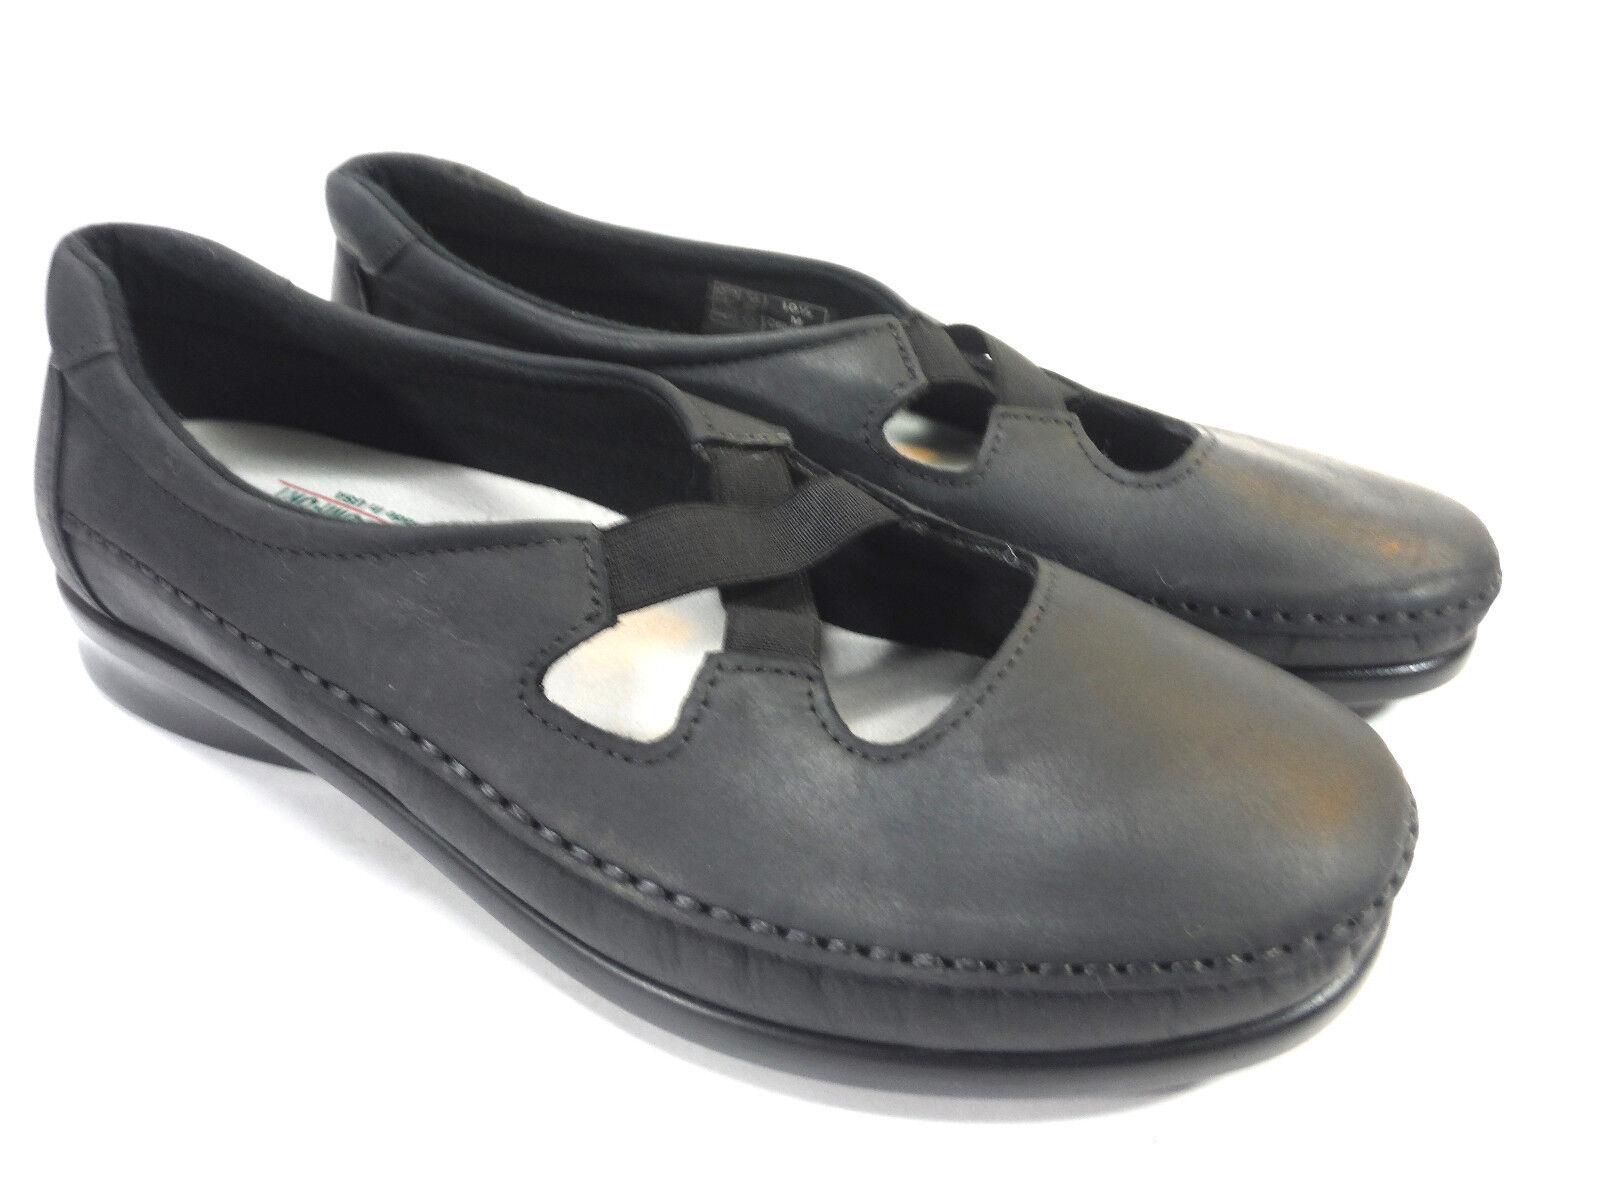 SAS TRIPAD Leder COMFORT SOFT STEP schwarz Leder TRIPAD mary jane walking low wedge loafers 63b5d9